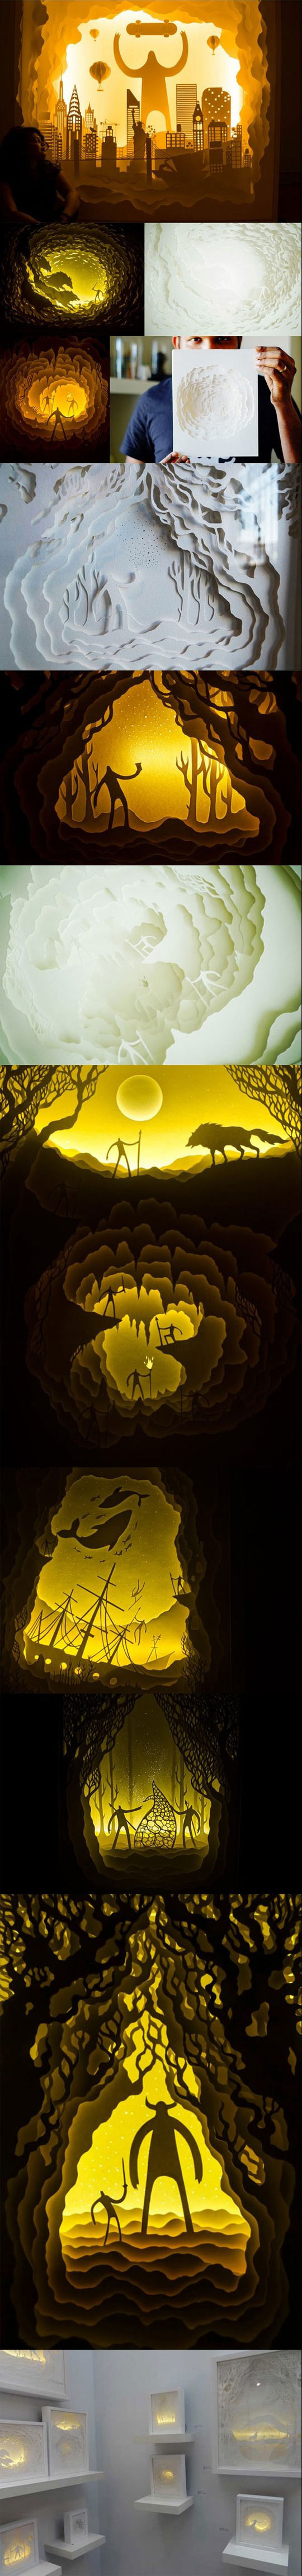 Illuminated Paper Cut Light Box Dioramas